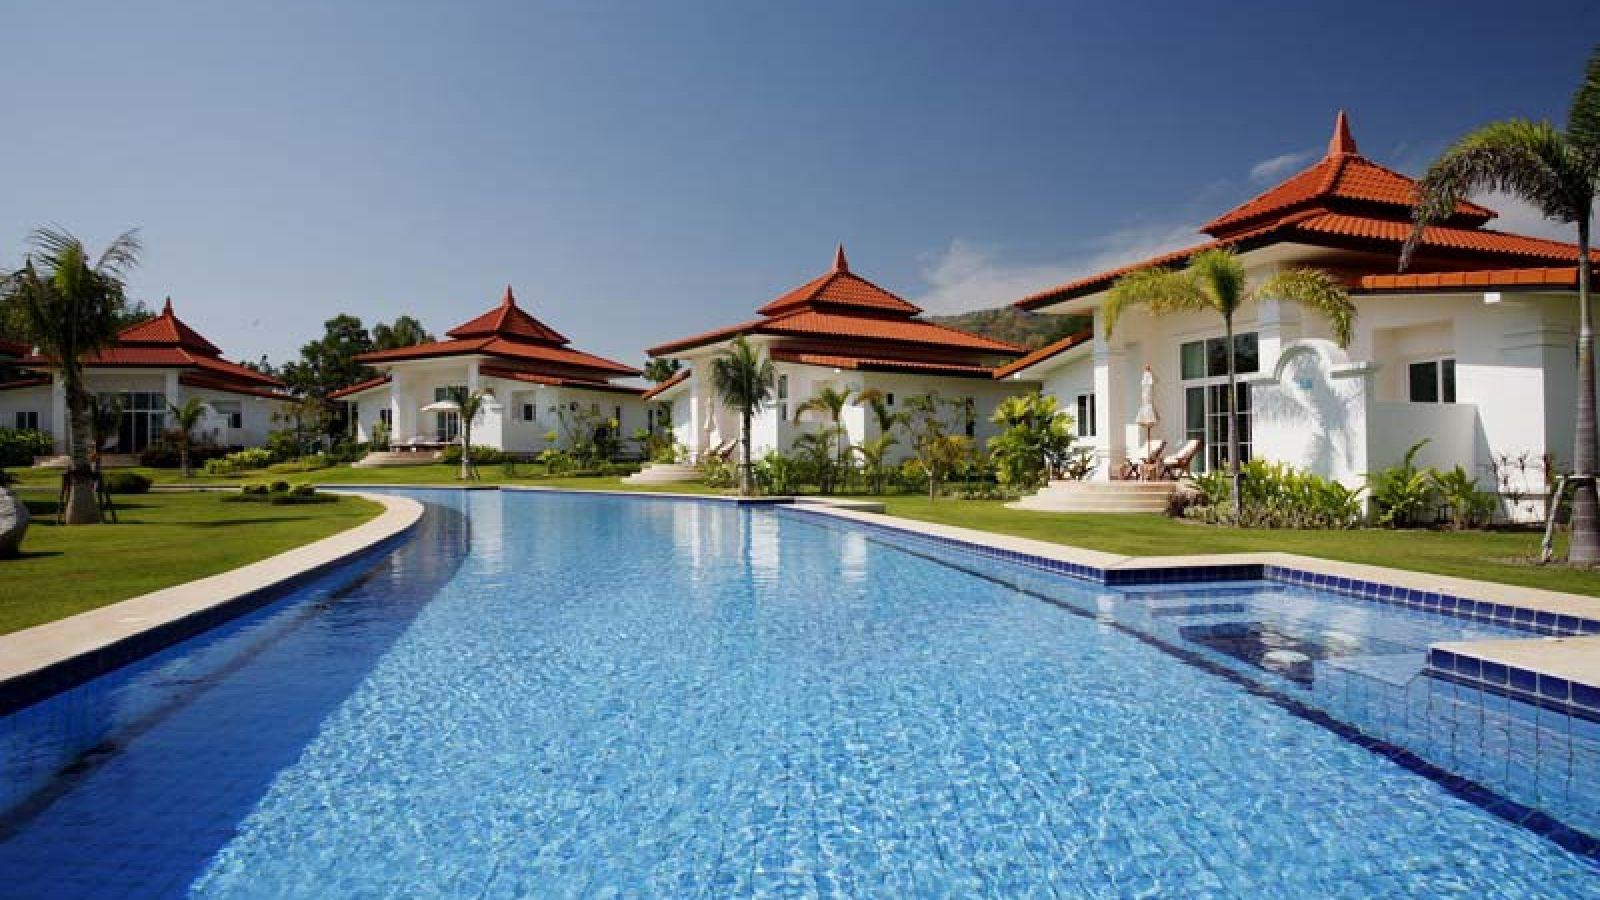 Banyon The Resort